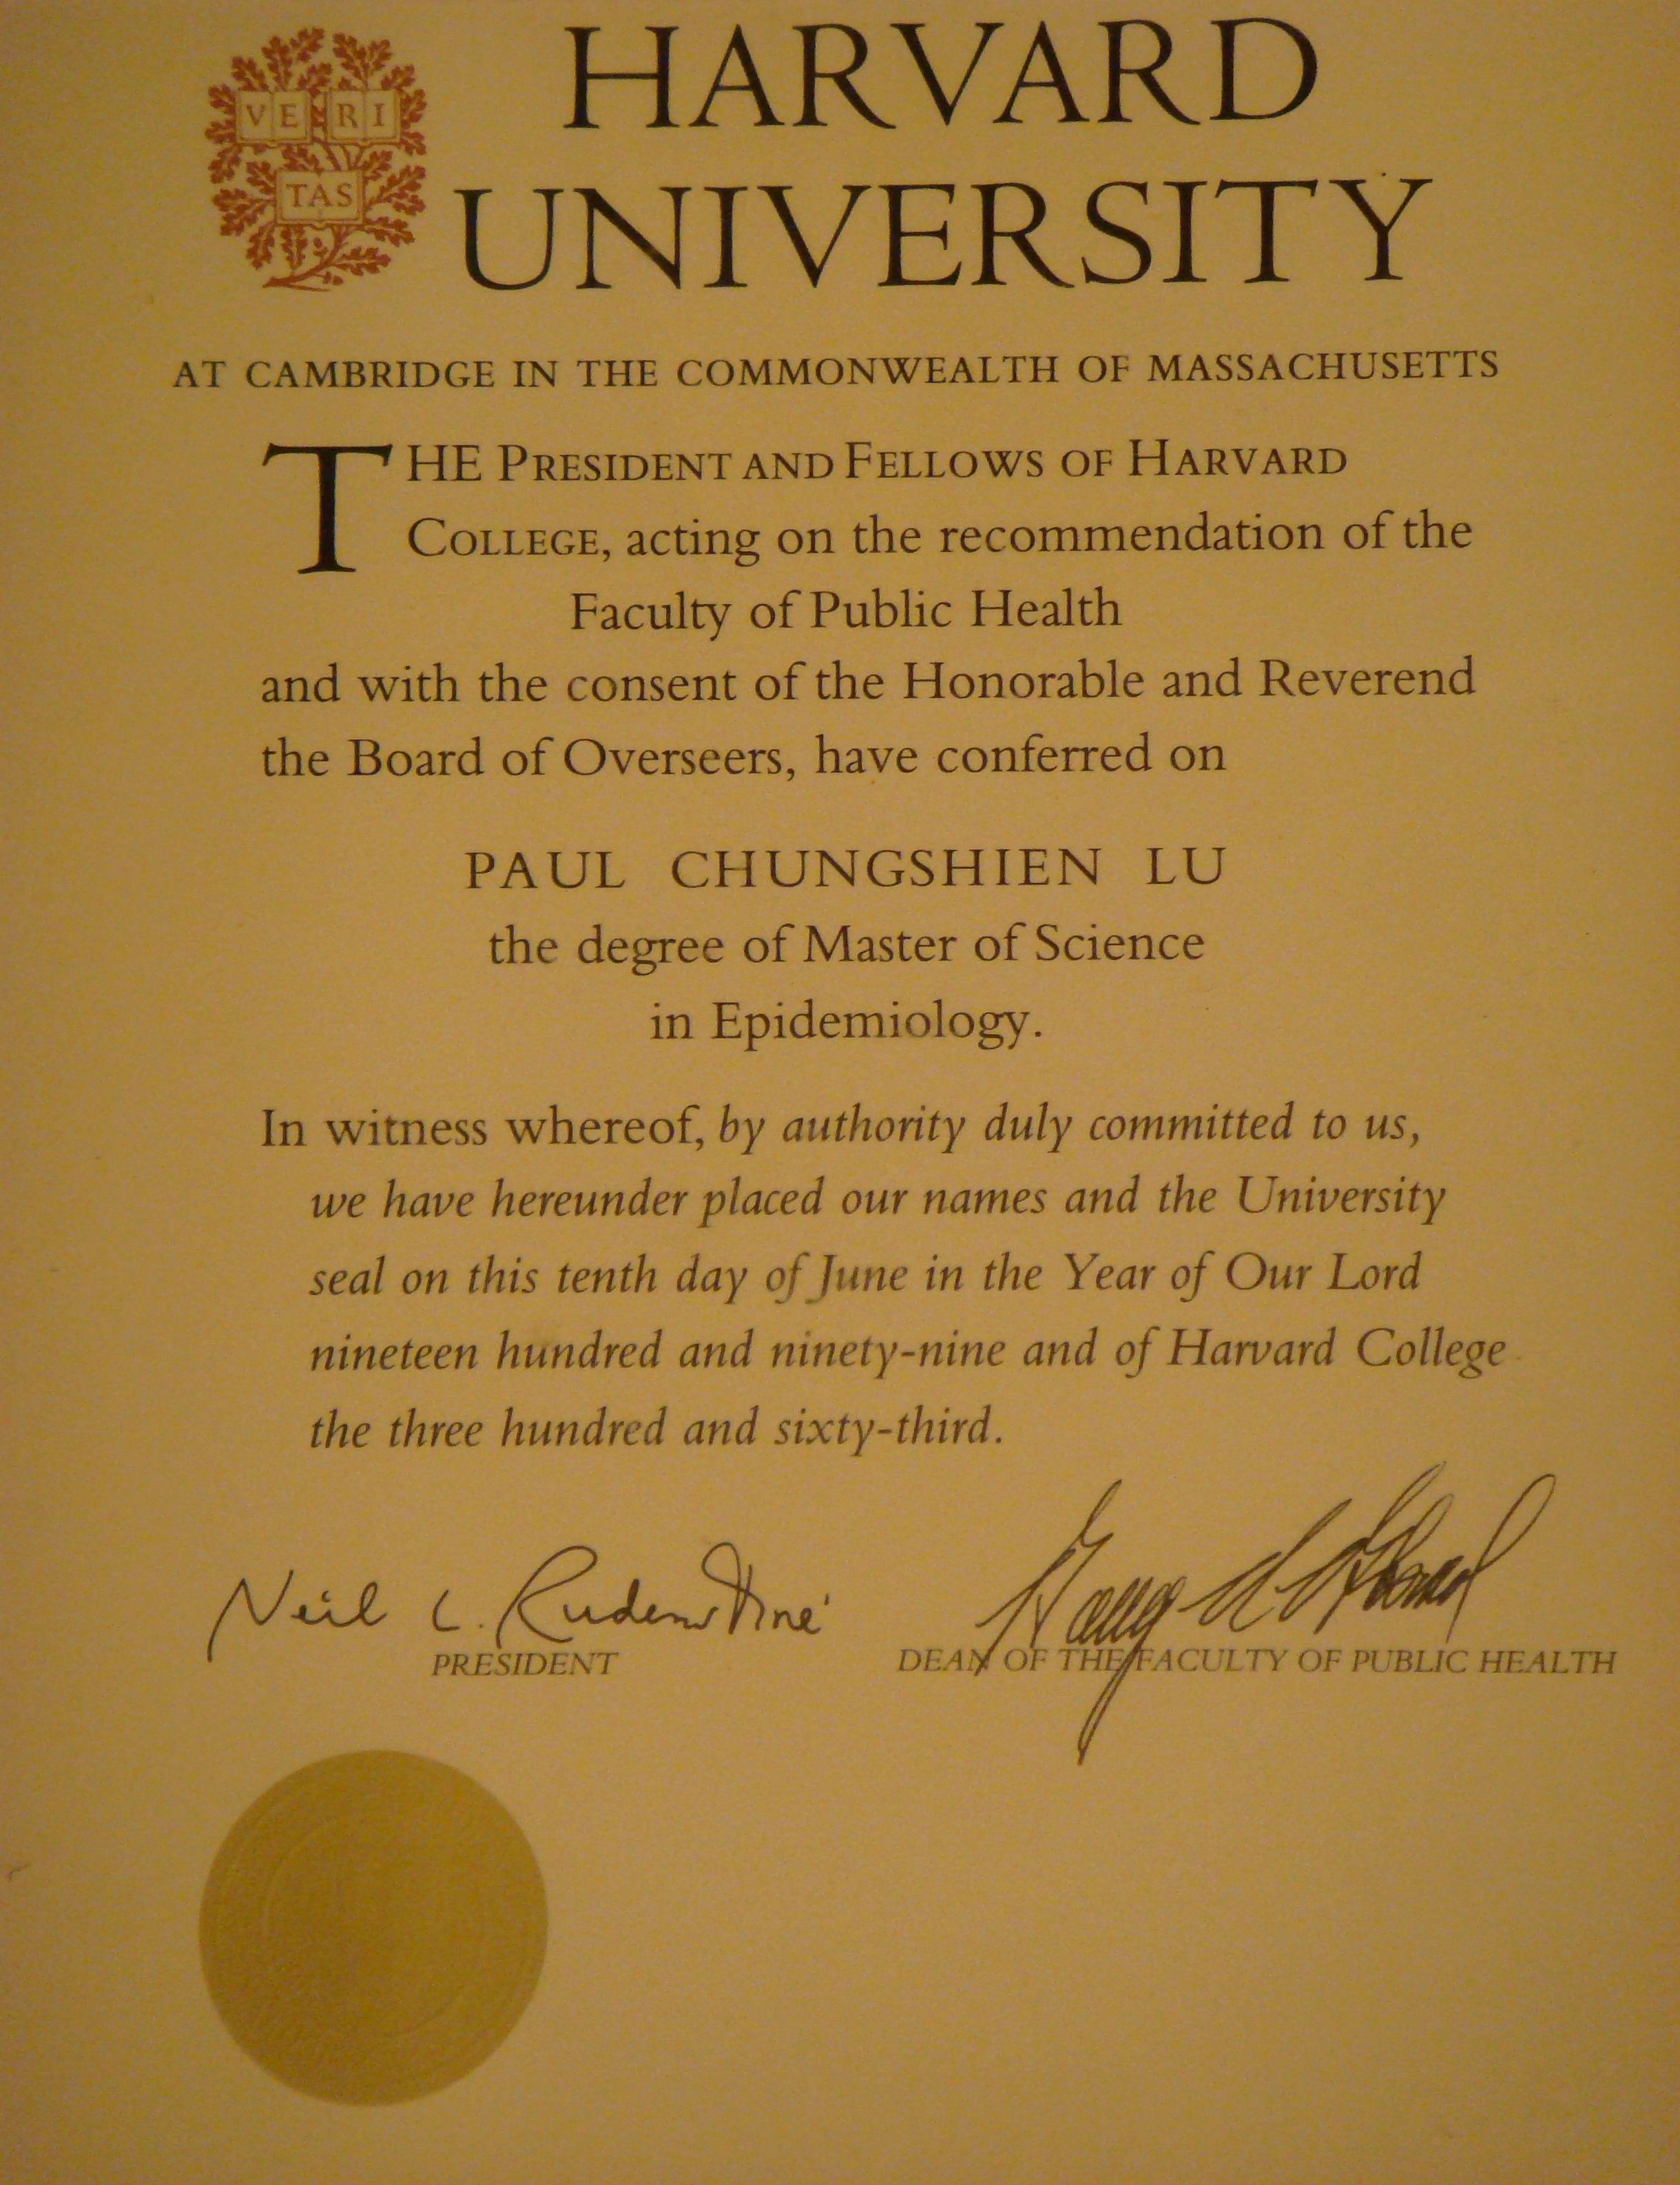 Harvard_diploma.JPG